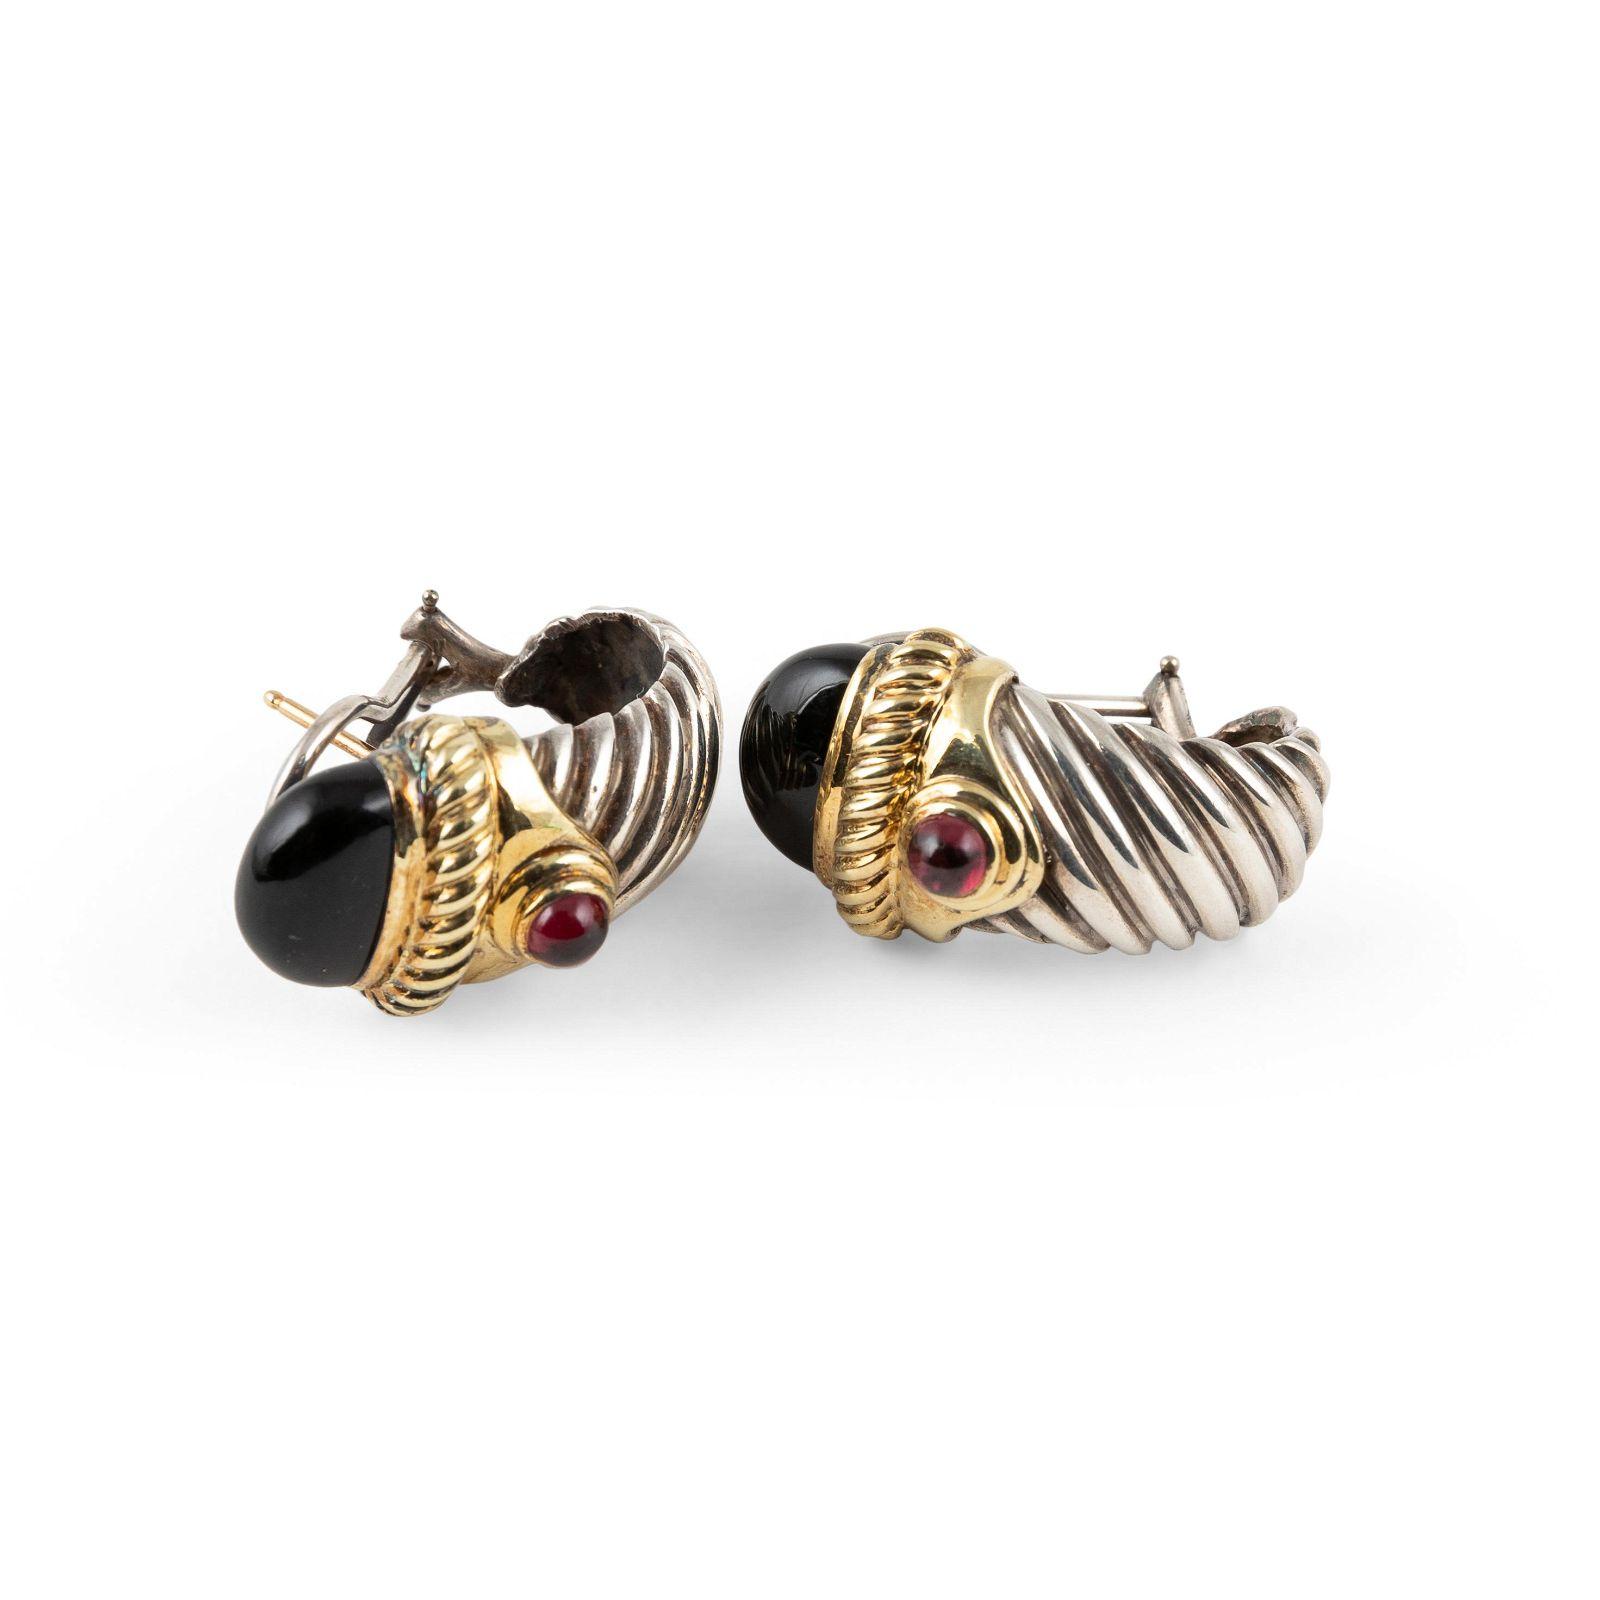 David Yurman - 14k Earrings